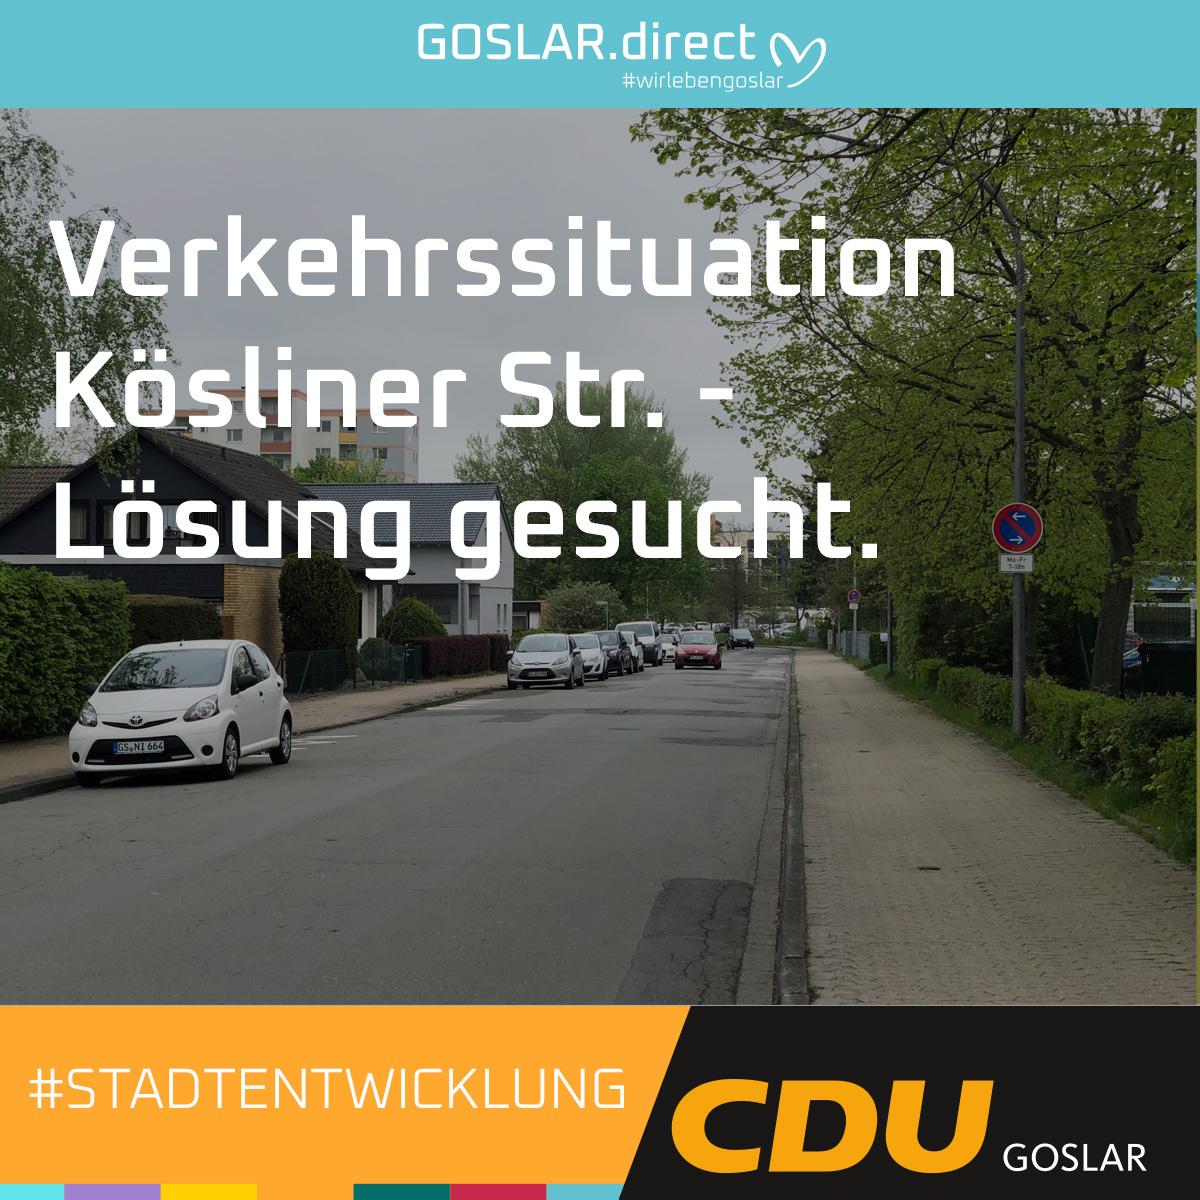 Verkehrssituation Kösliner Str. - Lösung gesucht